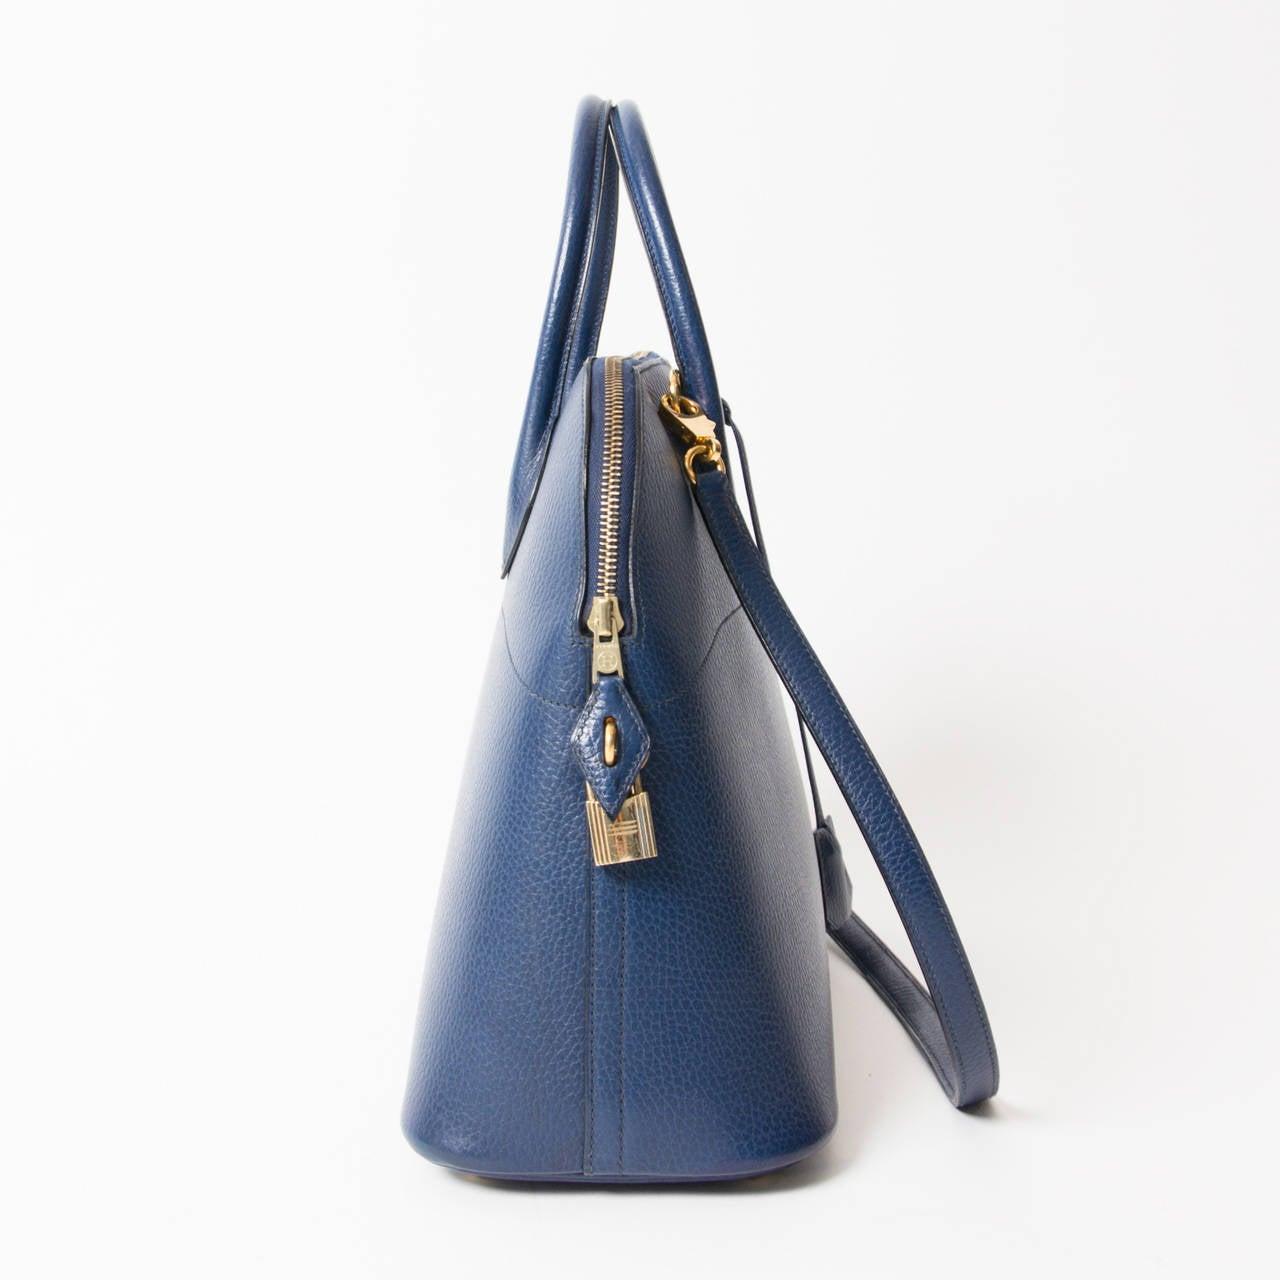 hermes kelly birkin bag - Hermes Bolide 35 Bleu Roi GHW at 1stdibs